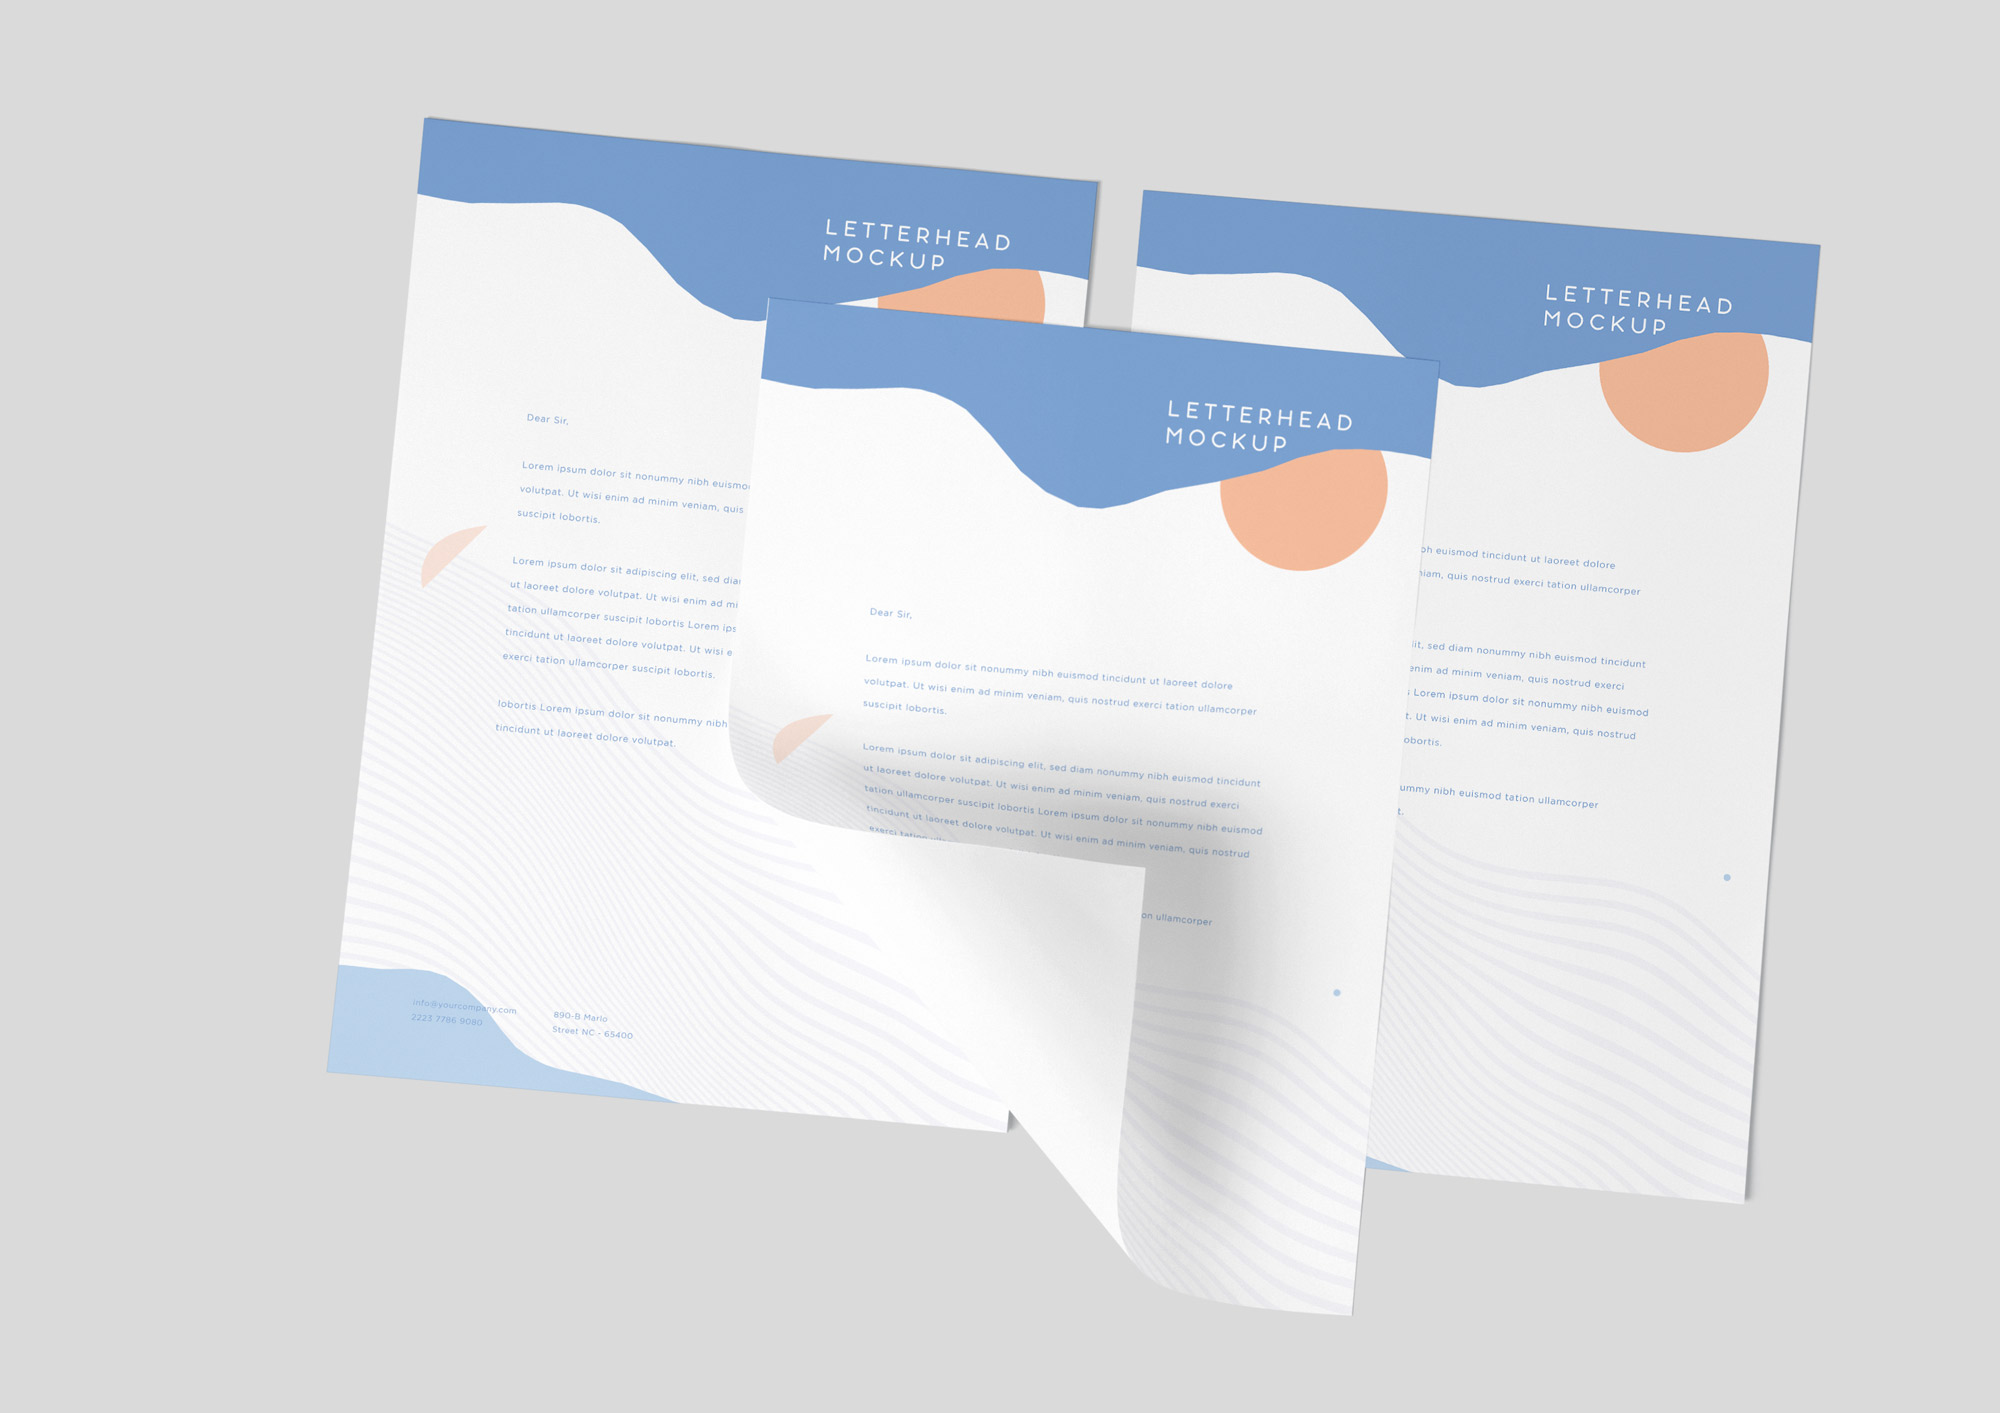 A4 Letterhead Mockup Vol-4 PSD